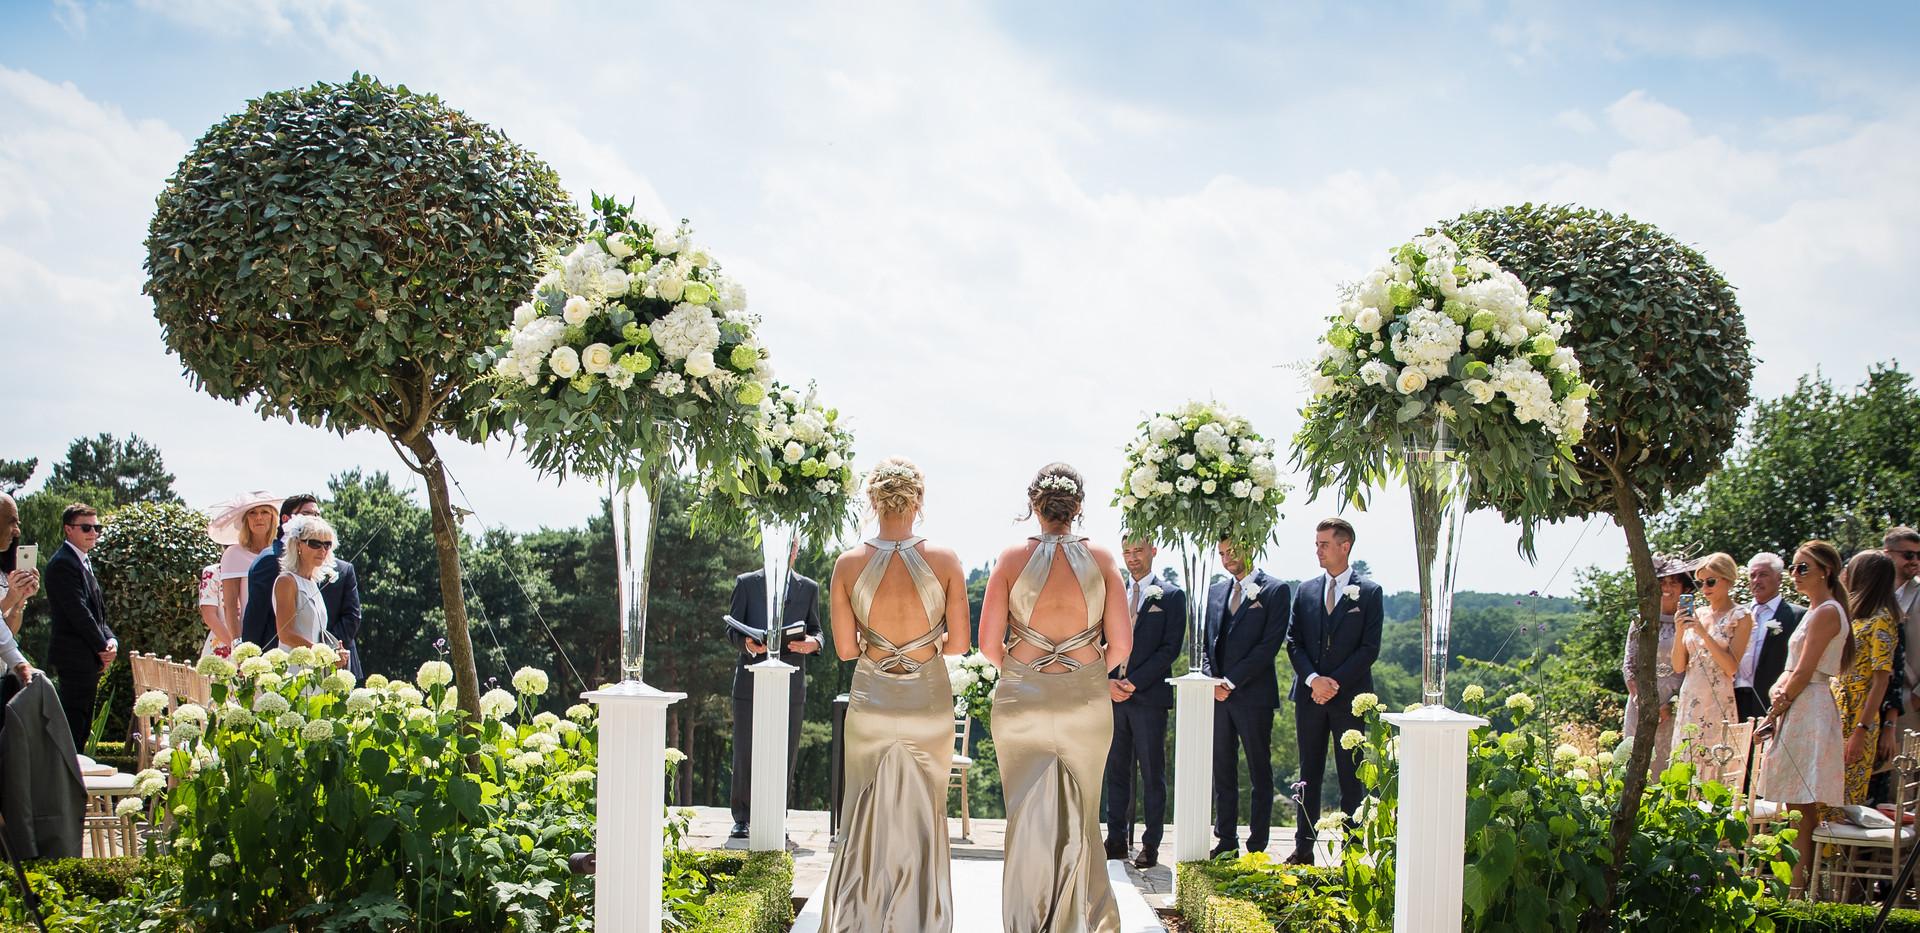 Delamere Manor Wedding Photography___21.